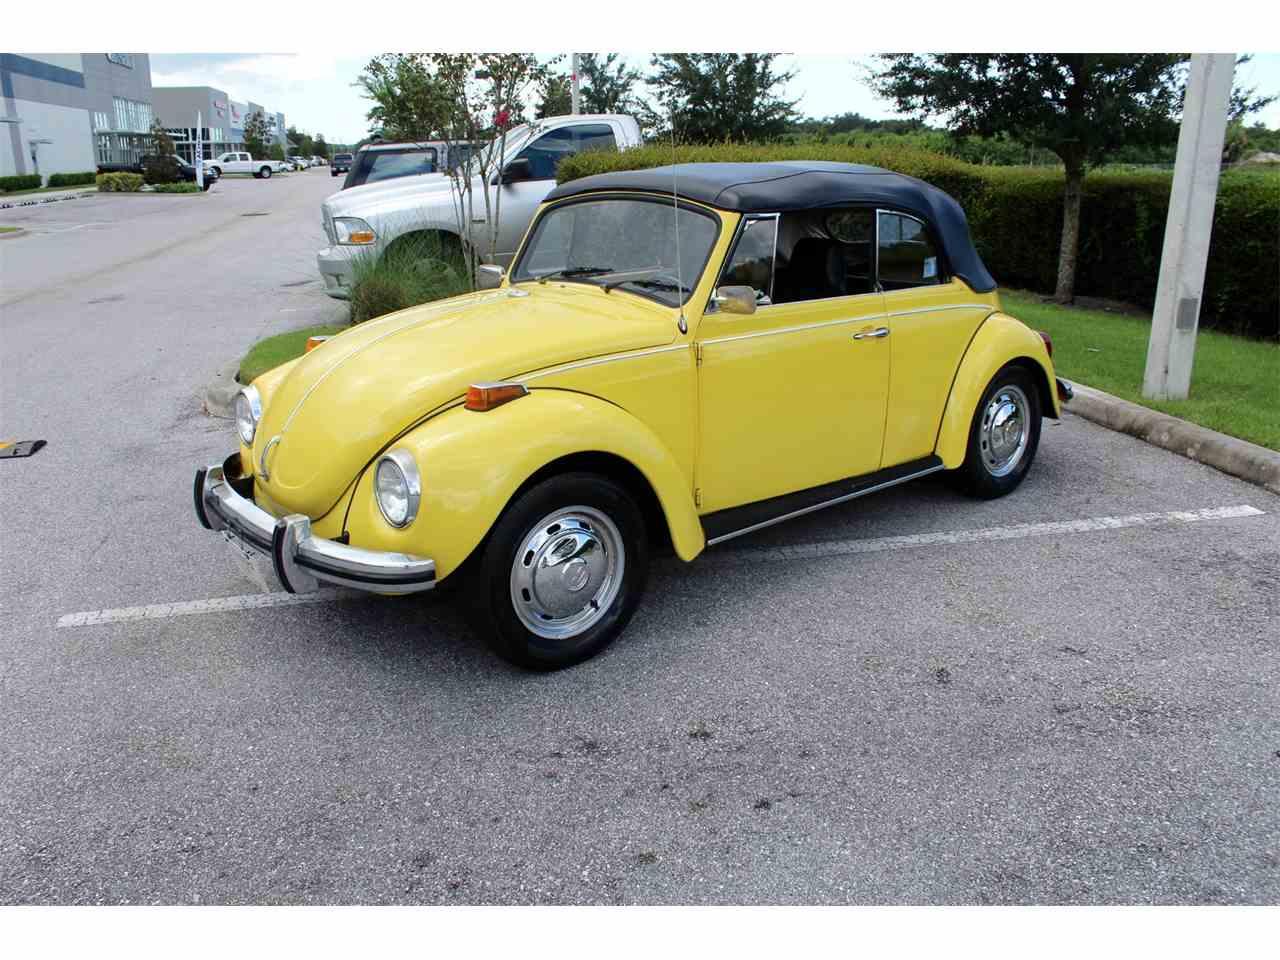 used sale c volkswagon convertible volkswagen beetle htm sarasota for stock near